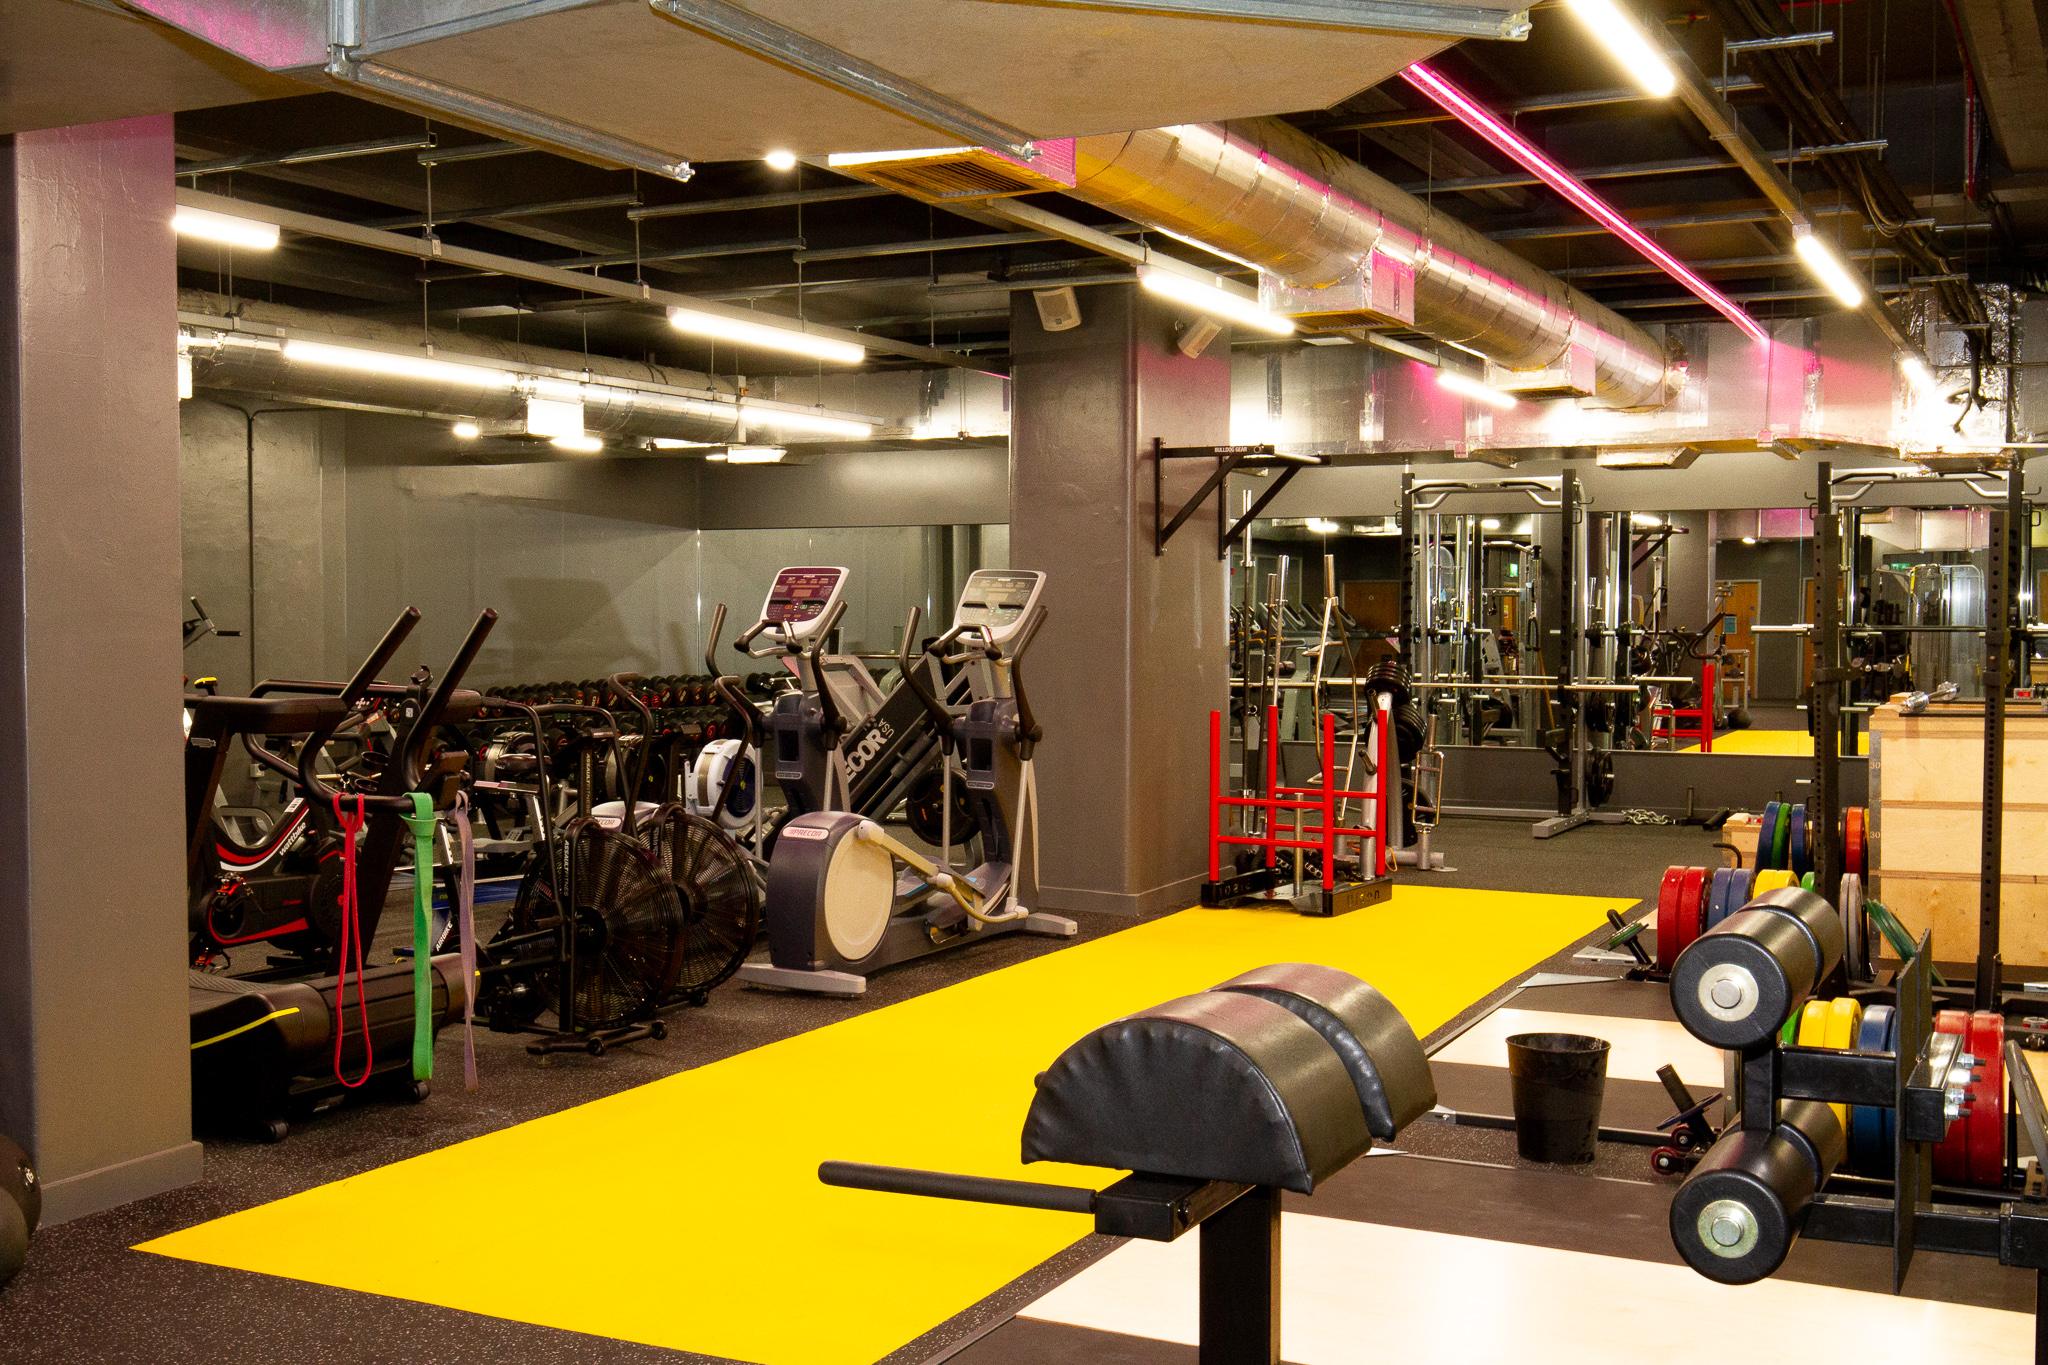 Closure of Regent Street Gym for summer refurbishment